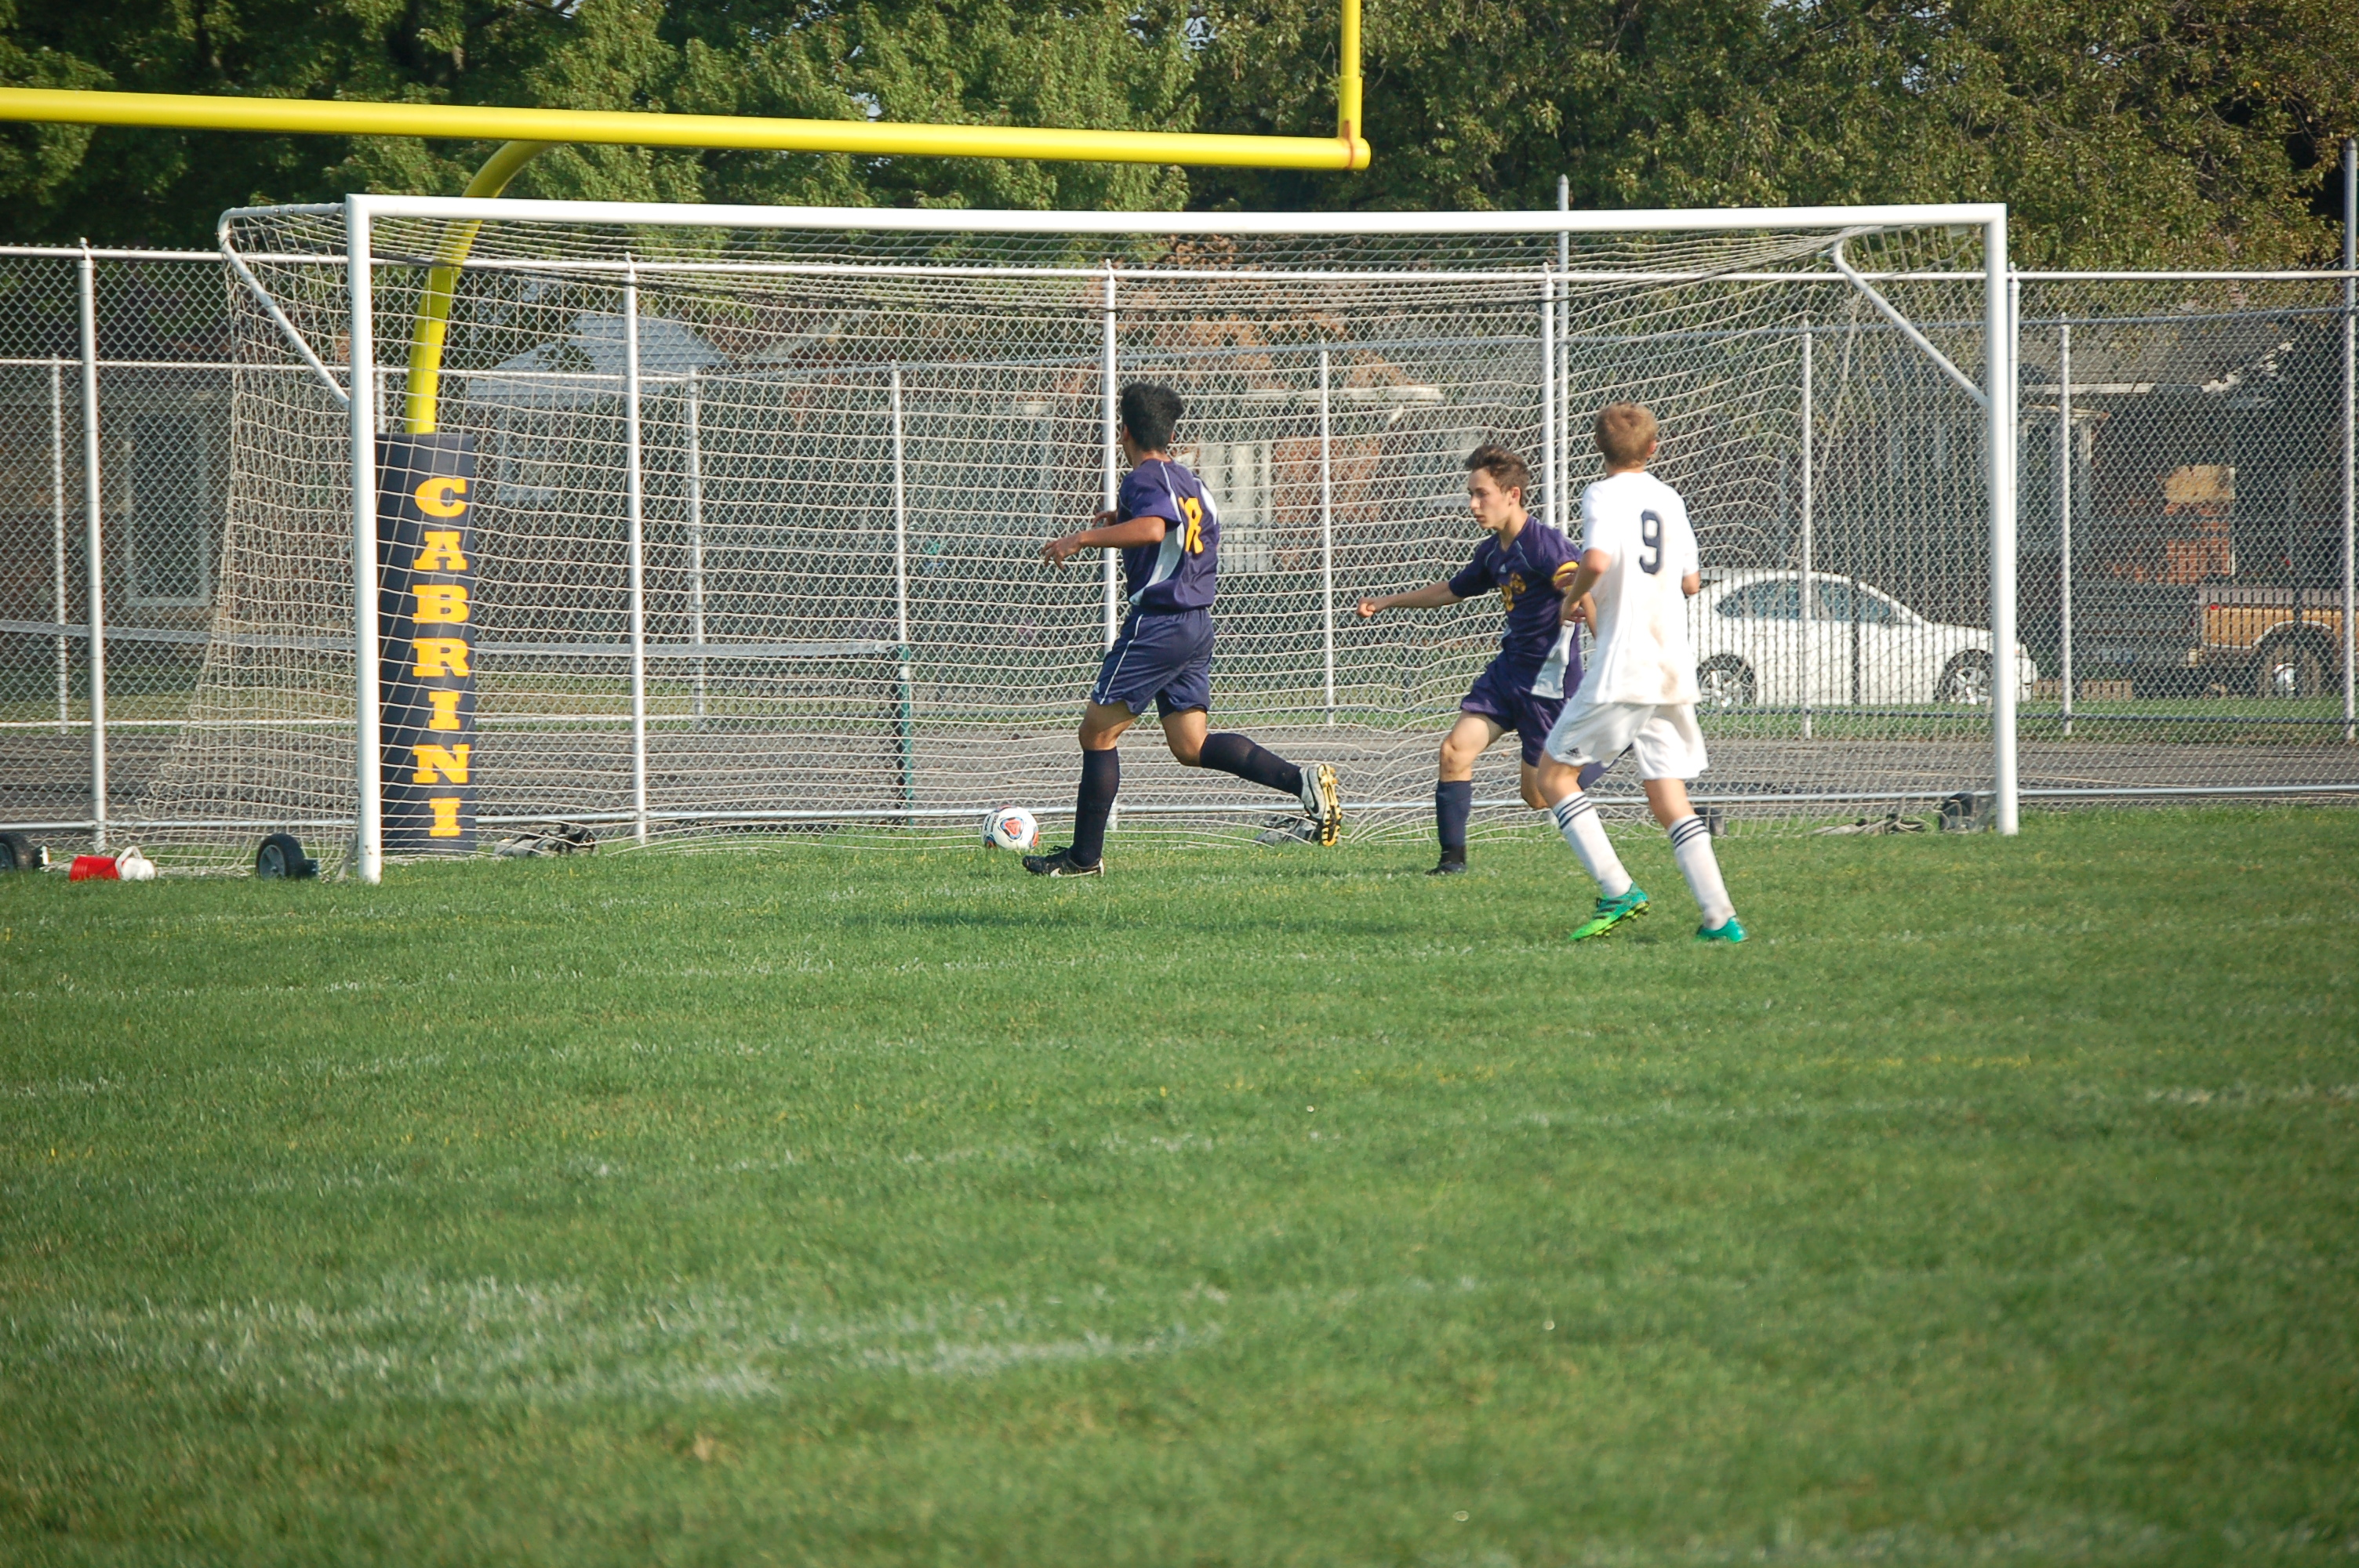 Cabrini defeats Jewish Academy 5-1